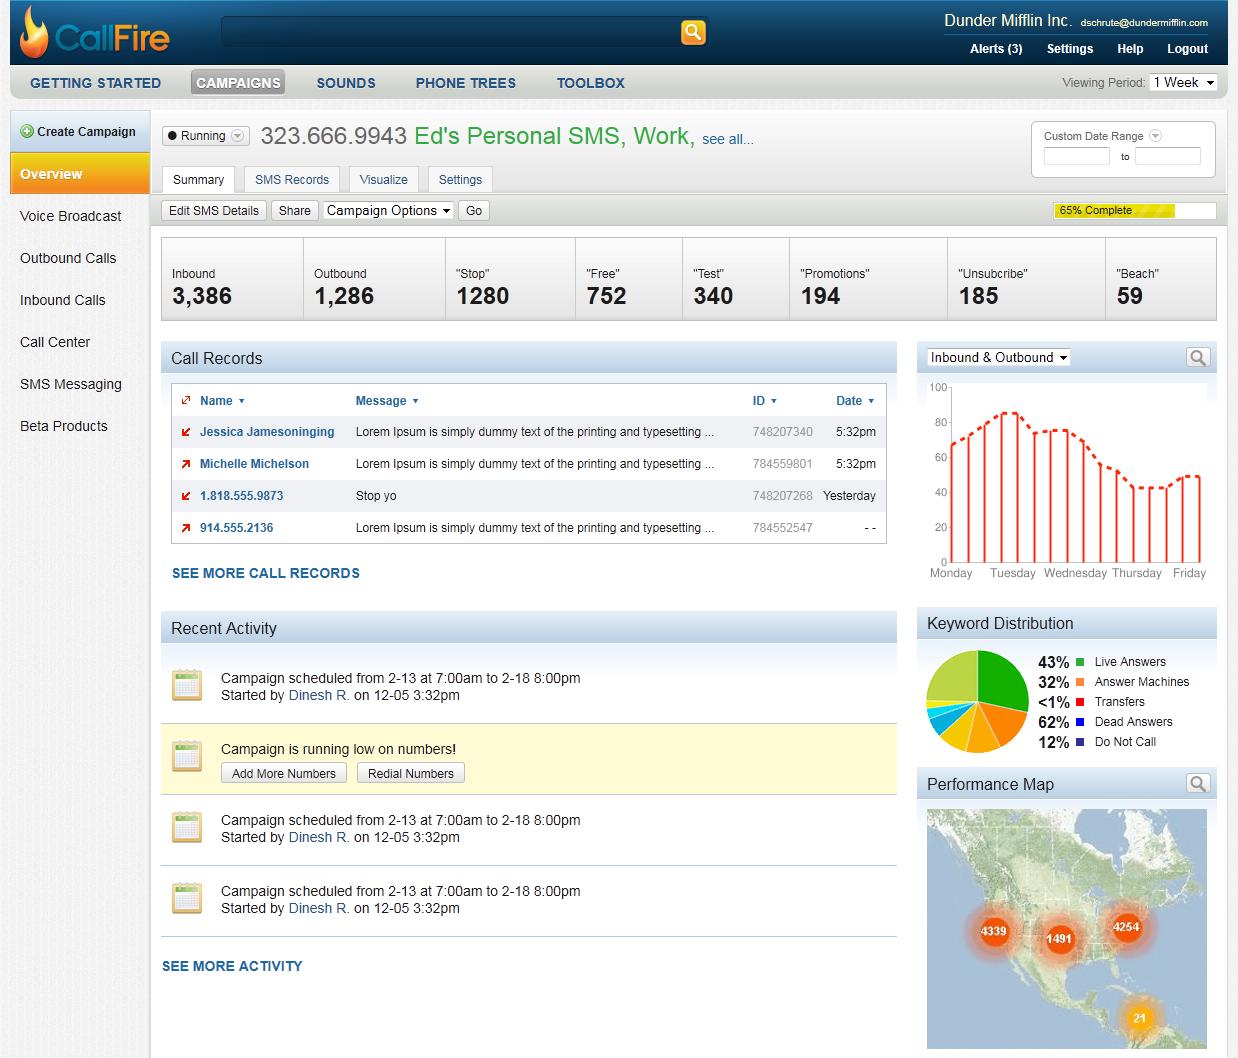 Tracking campaigns in CallFire